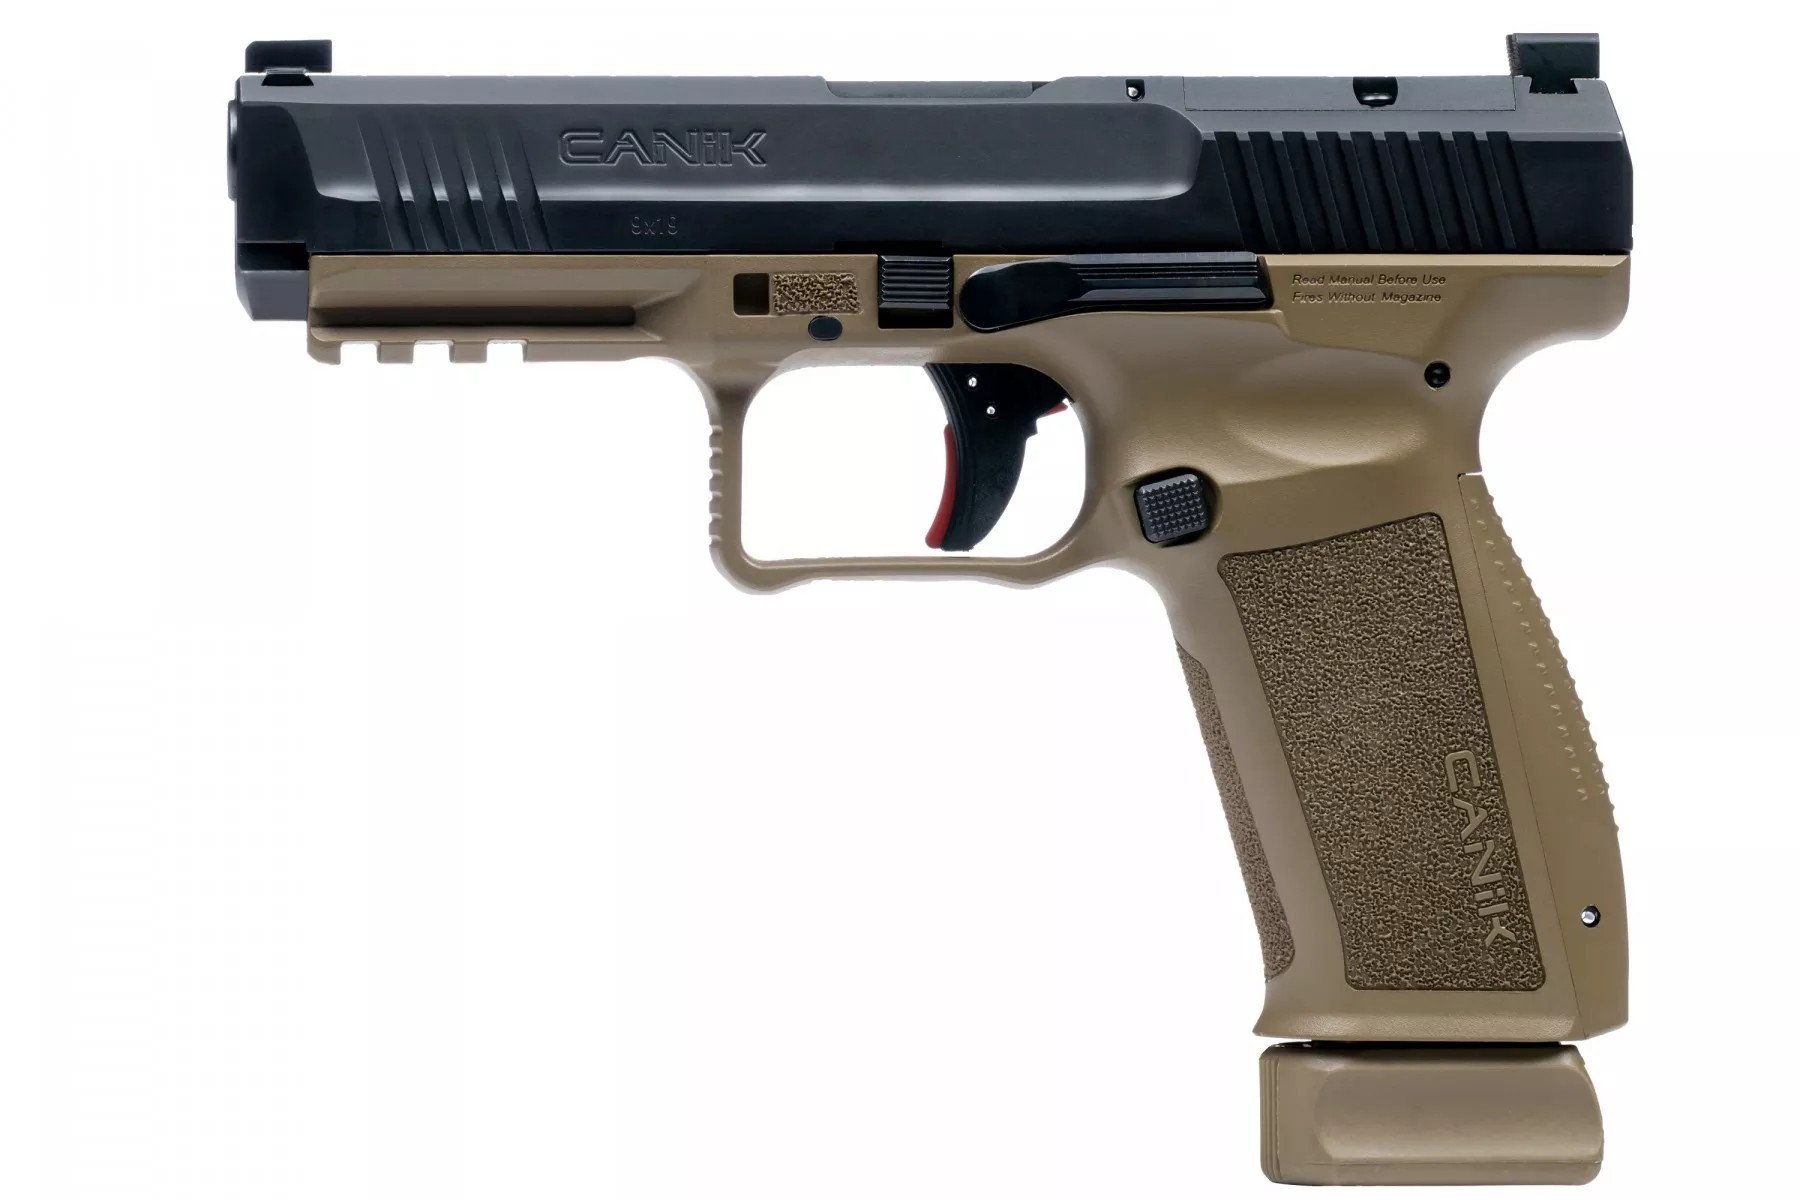 canik usa mete series pistol 9mm competition handgun 9mm